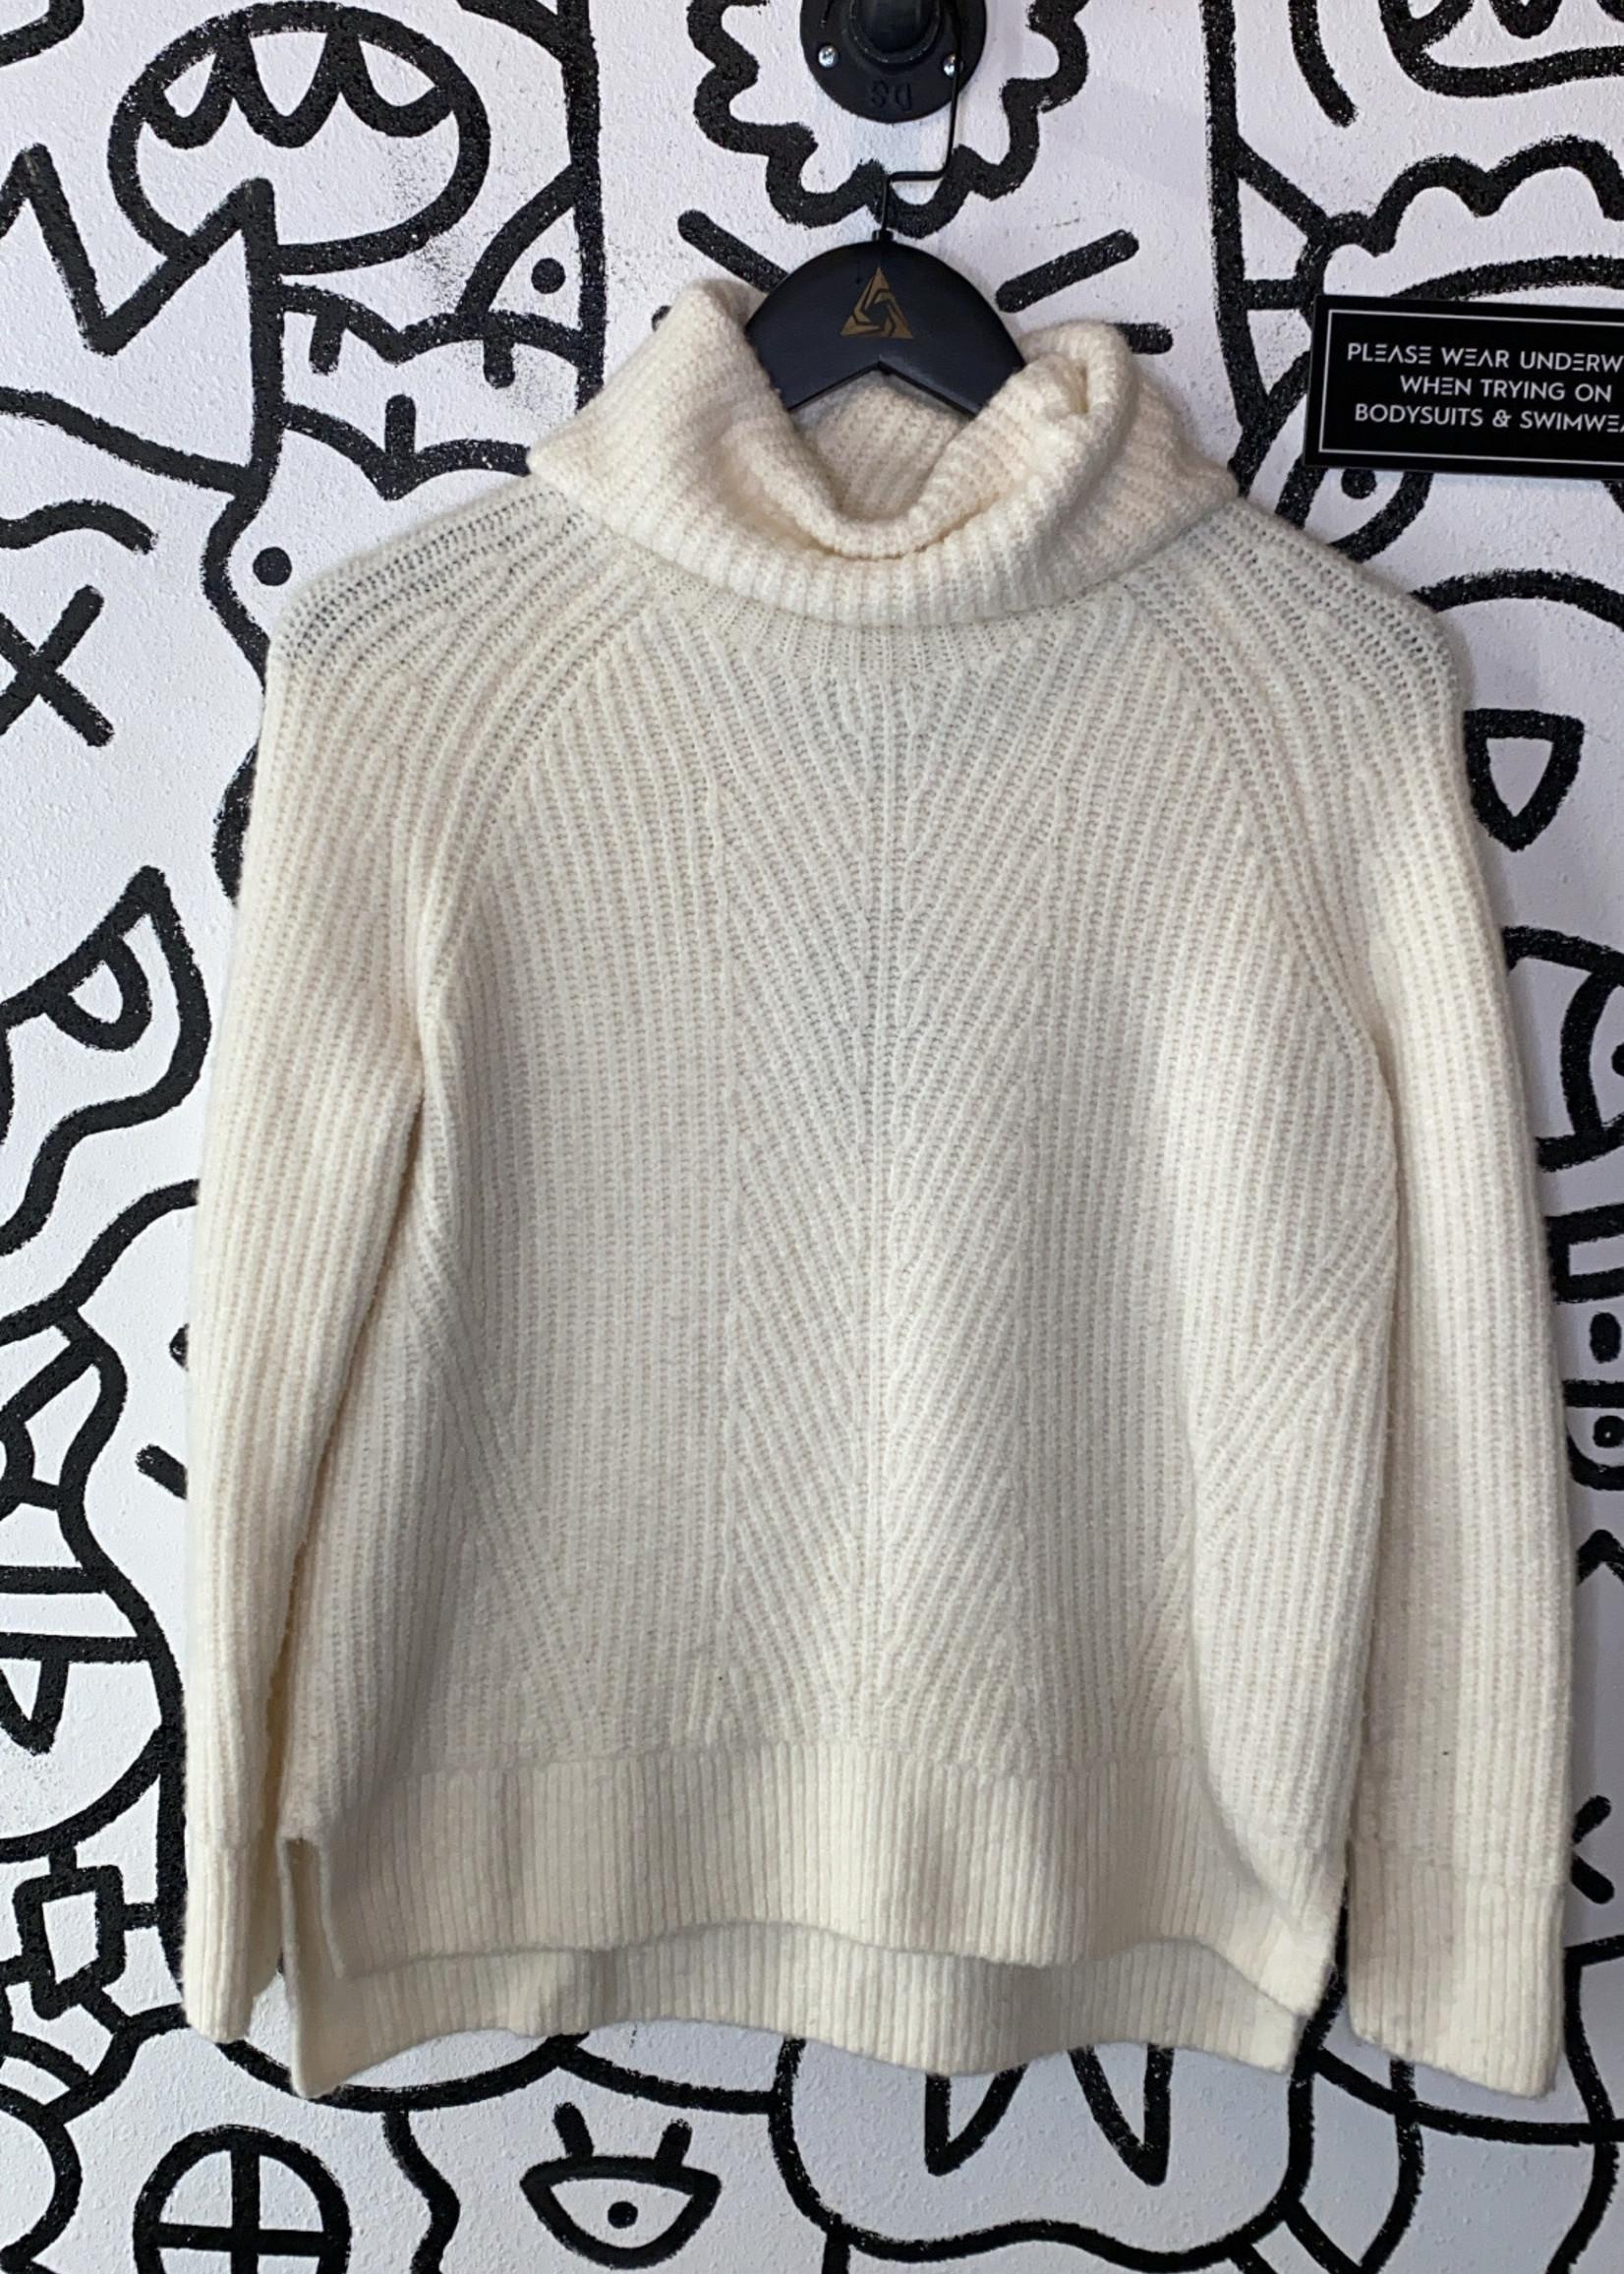 Madewell White Turtleneck Sweater XS